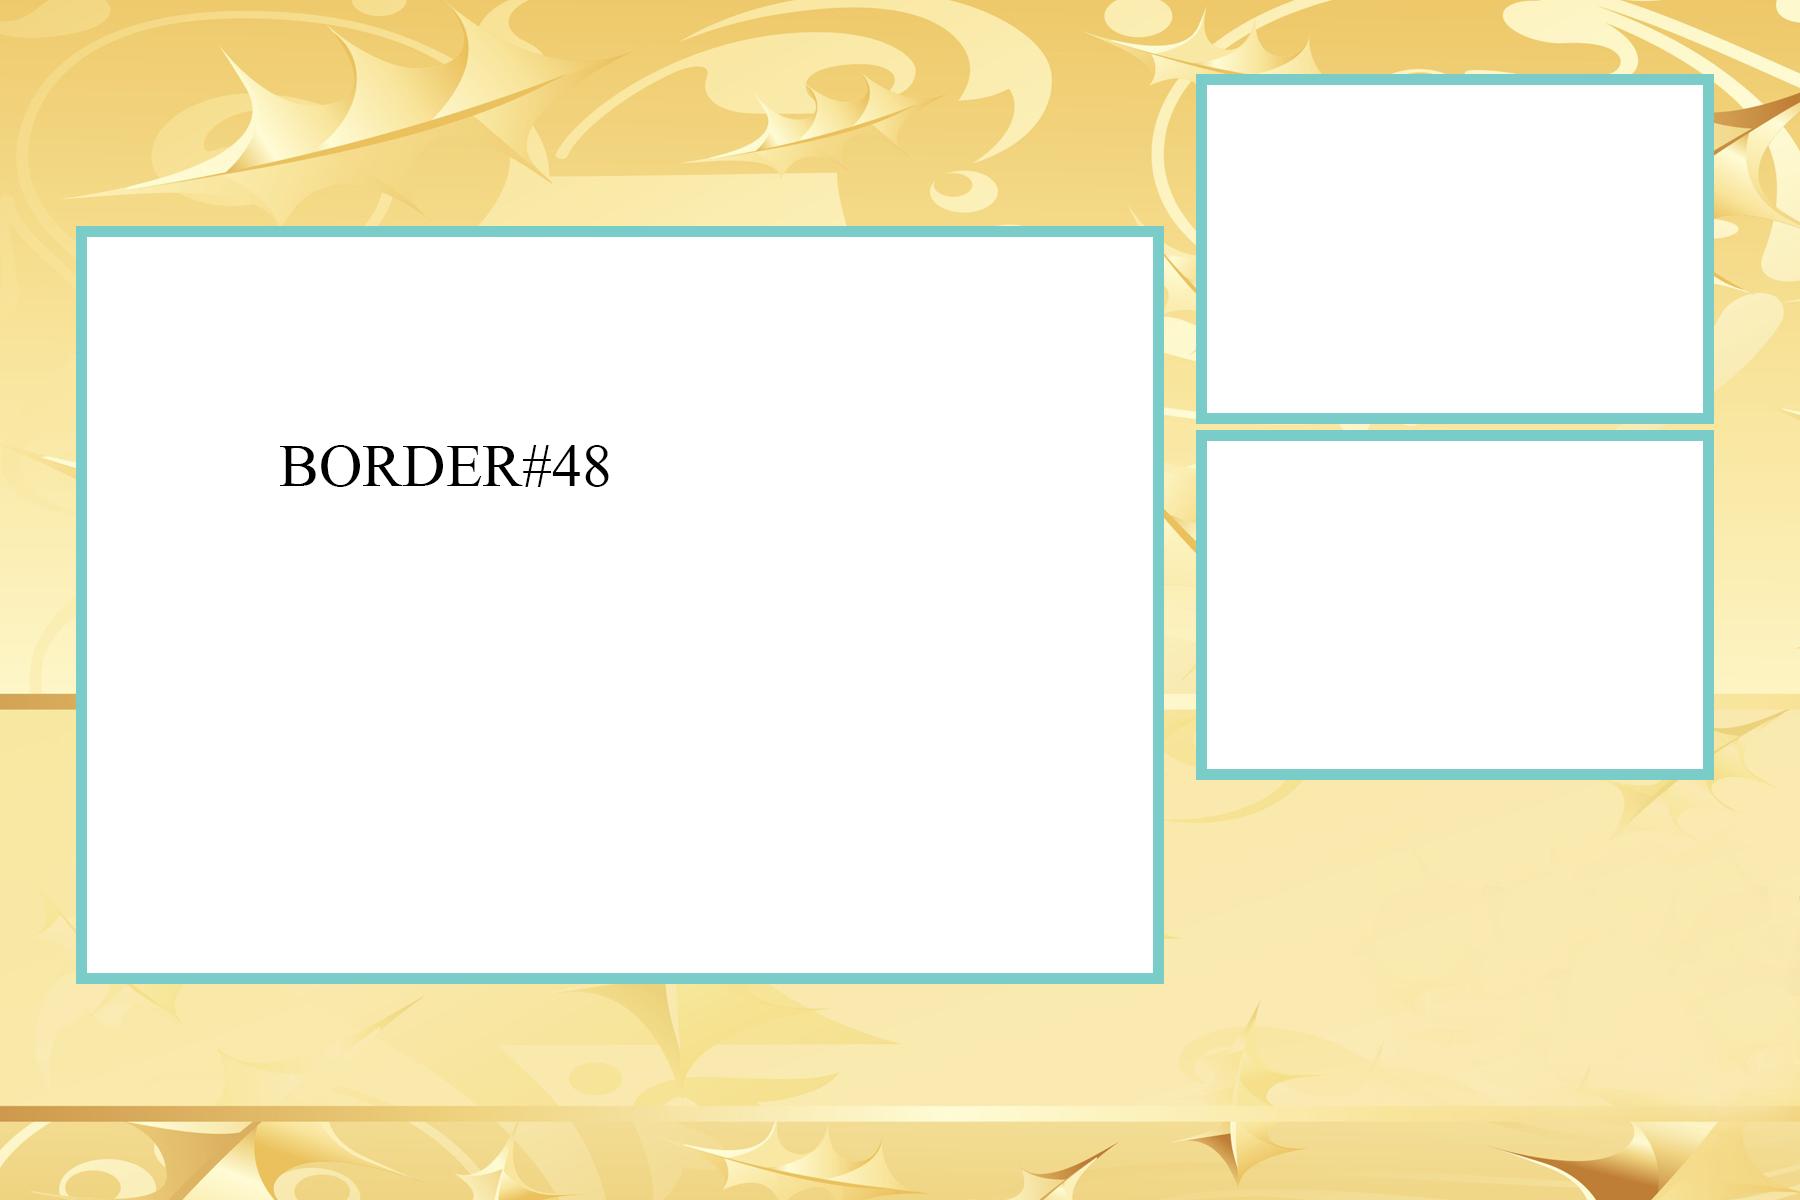 BORDER#48